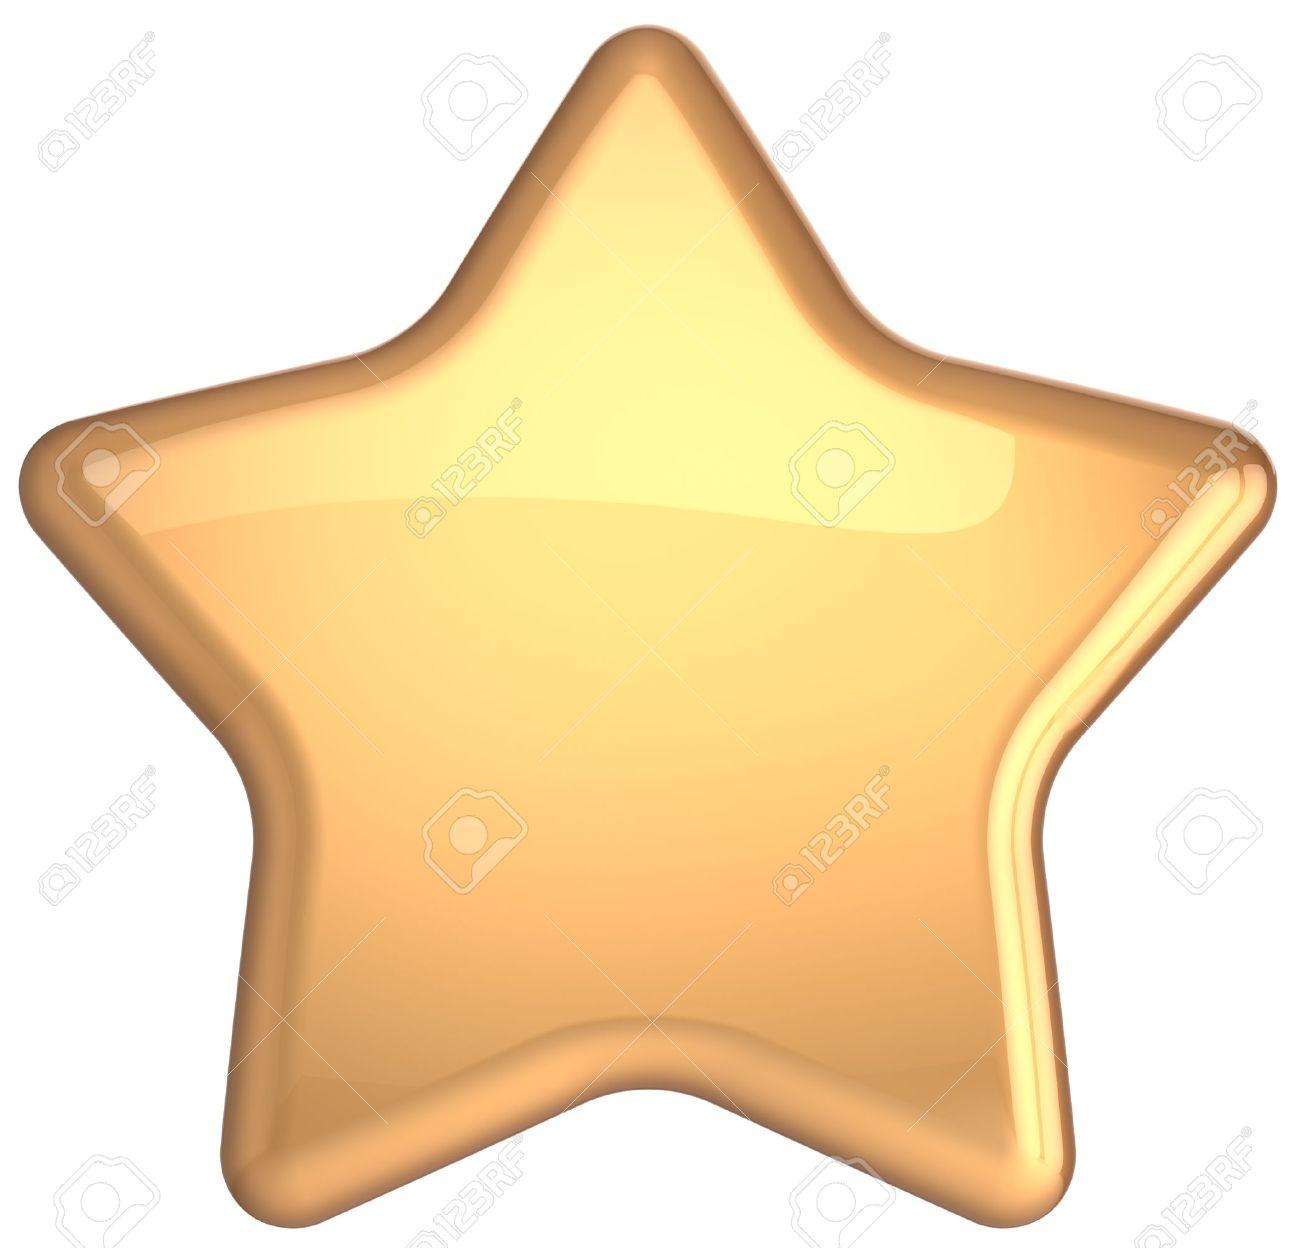 golden star gold decoration prestige congratulation win very stock rh 123rf com free clipart gold star golden star clipart